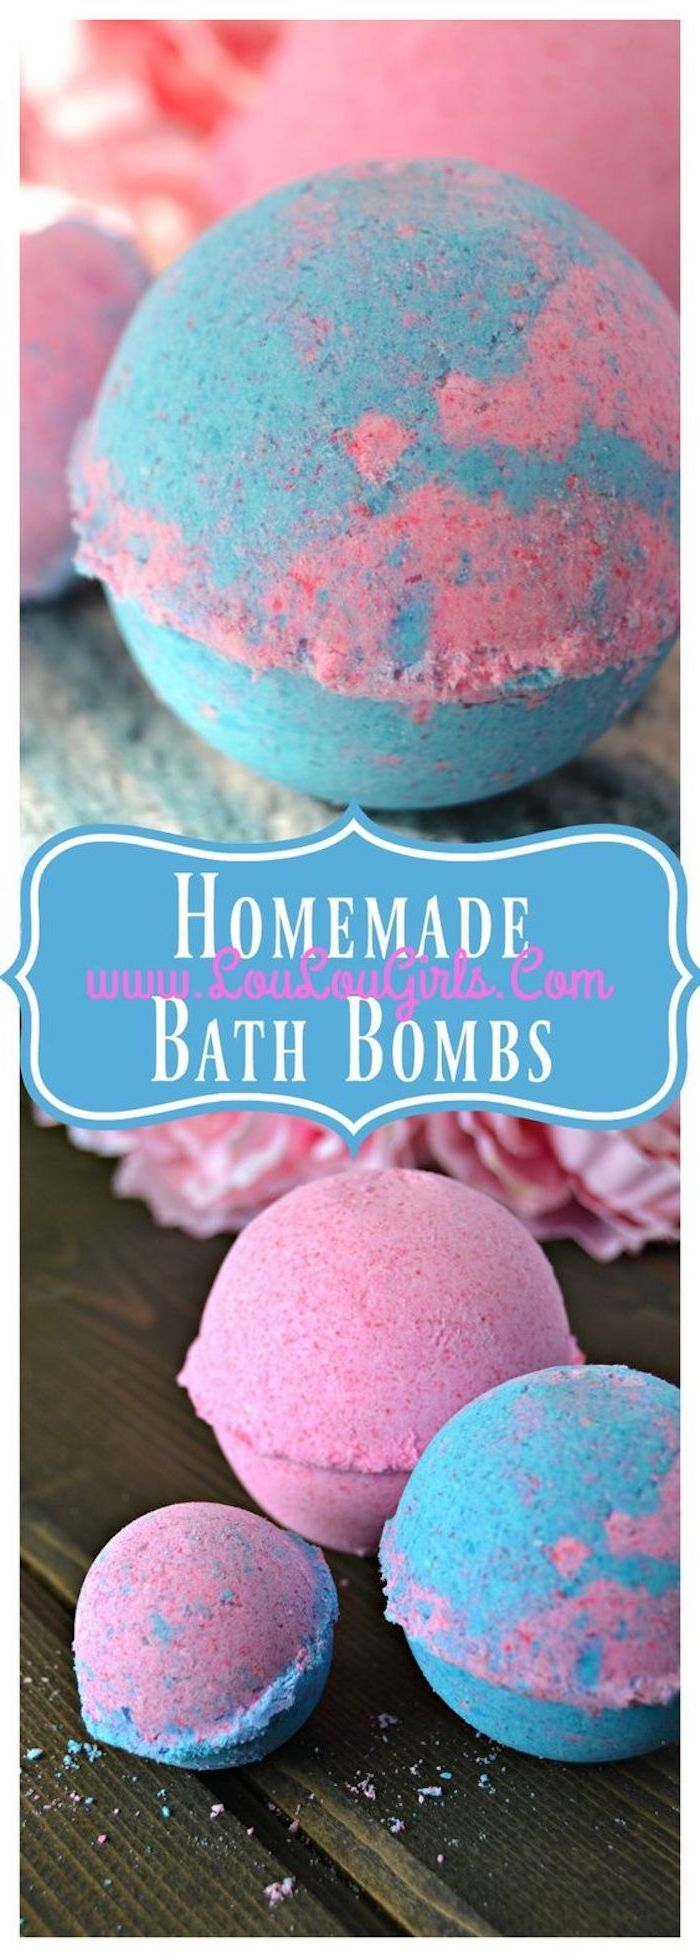 badekugeln selber machen 10 einfache und coole rezepte make up homemade bath bombs bath. Black Bedroom Furniture Sets. Home Design Ideas